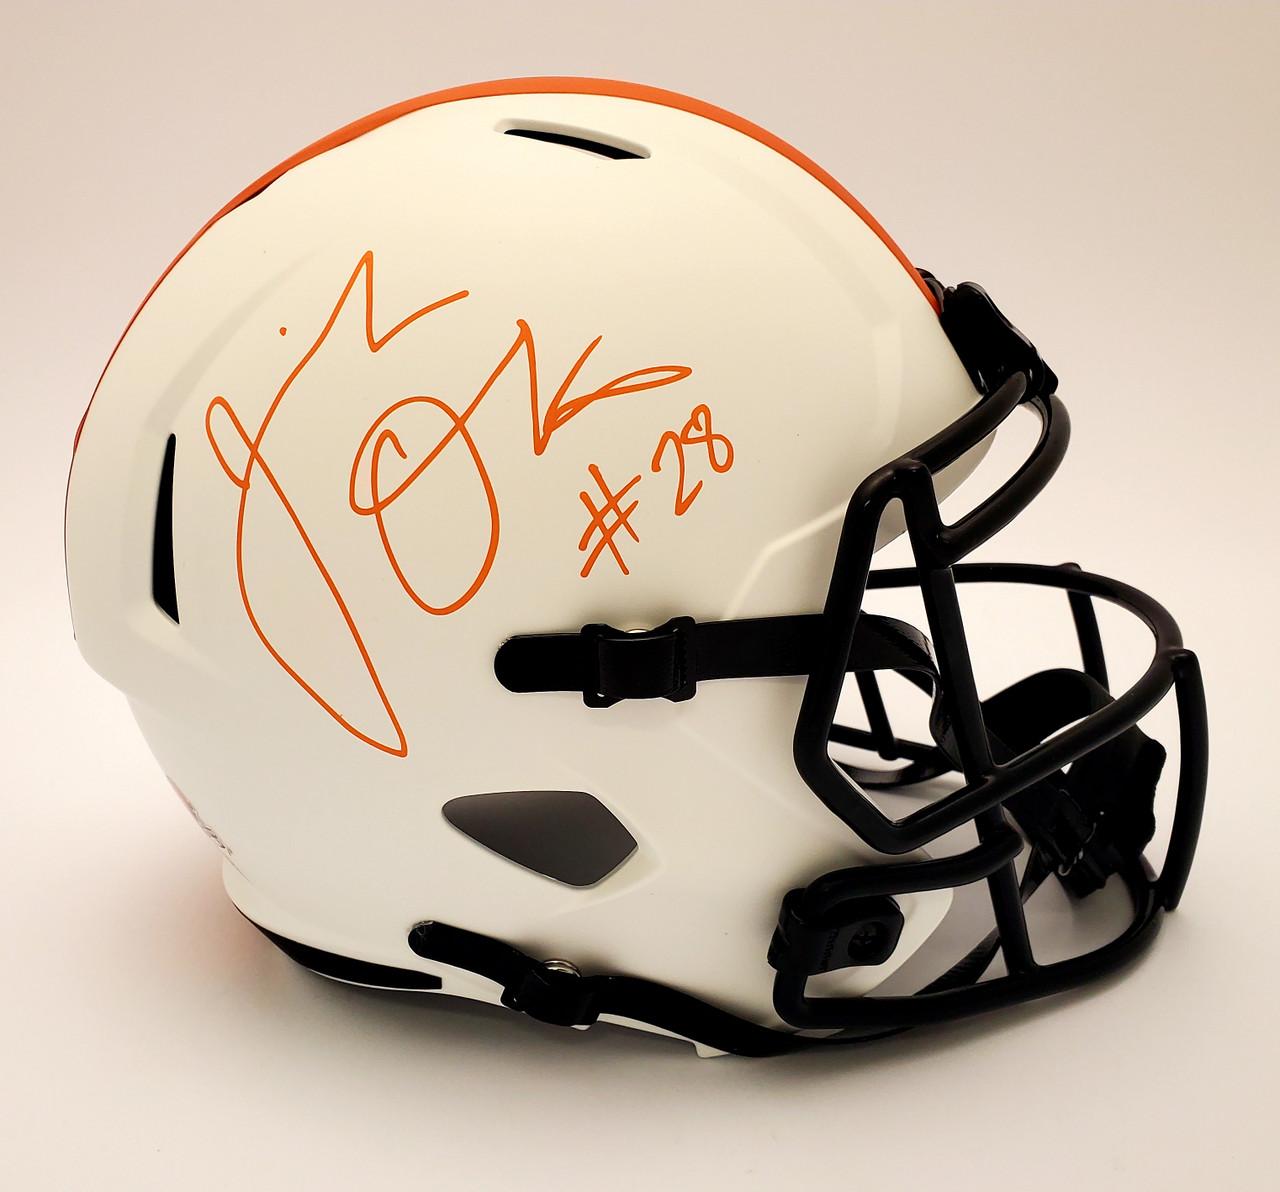 Jeremiah Owusu-Koramoah Cleveland Browns Autographed Lunar Replica Helmet - Beckett Authentic